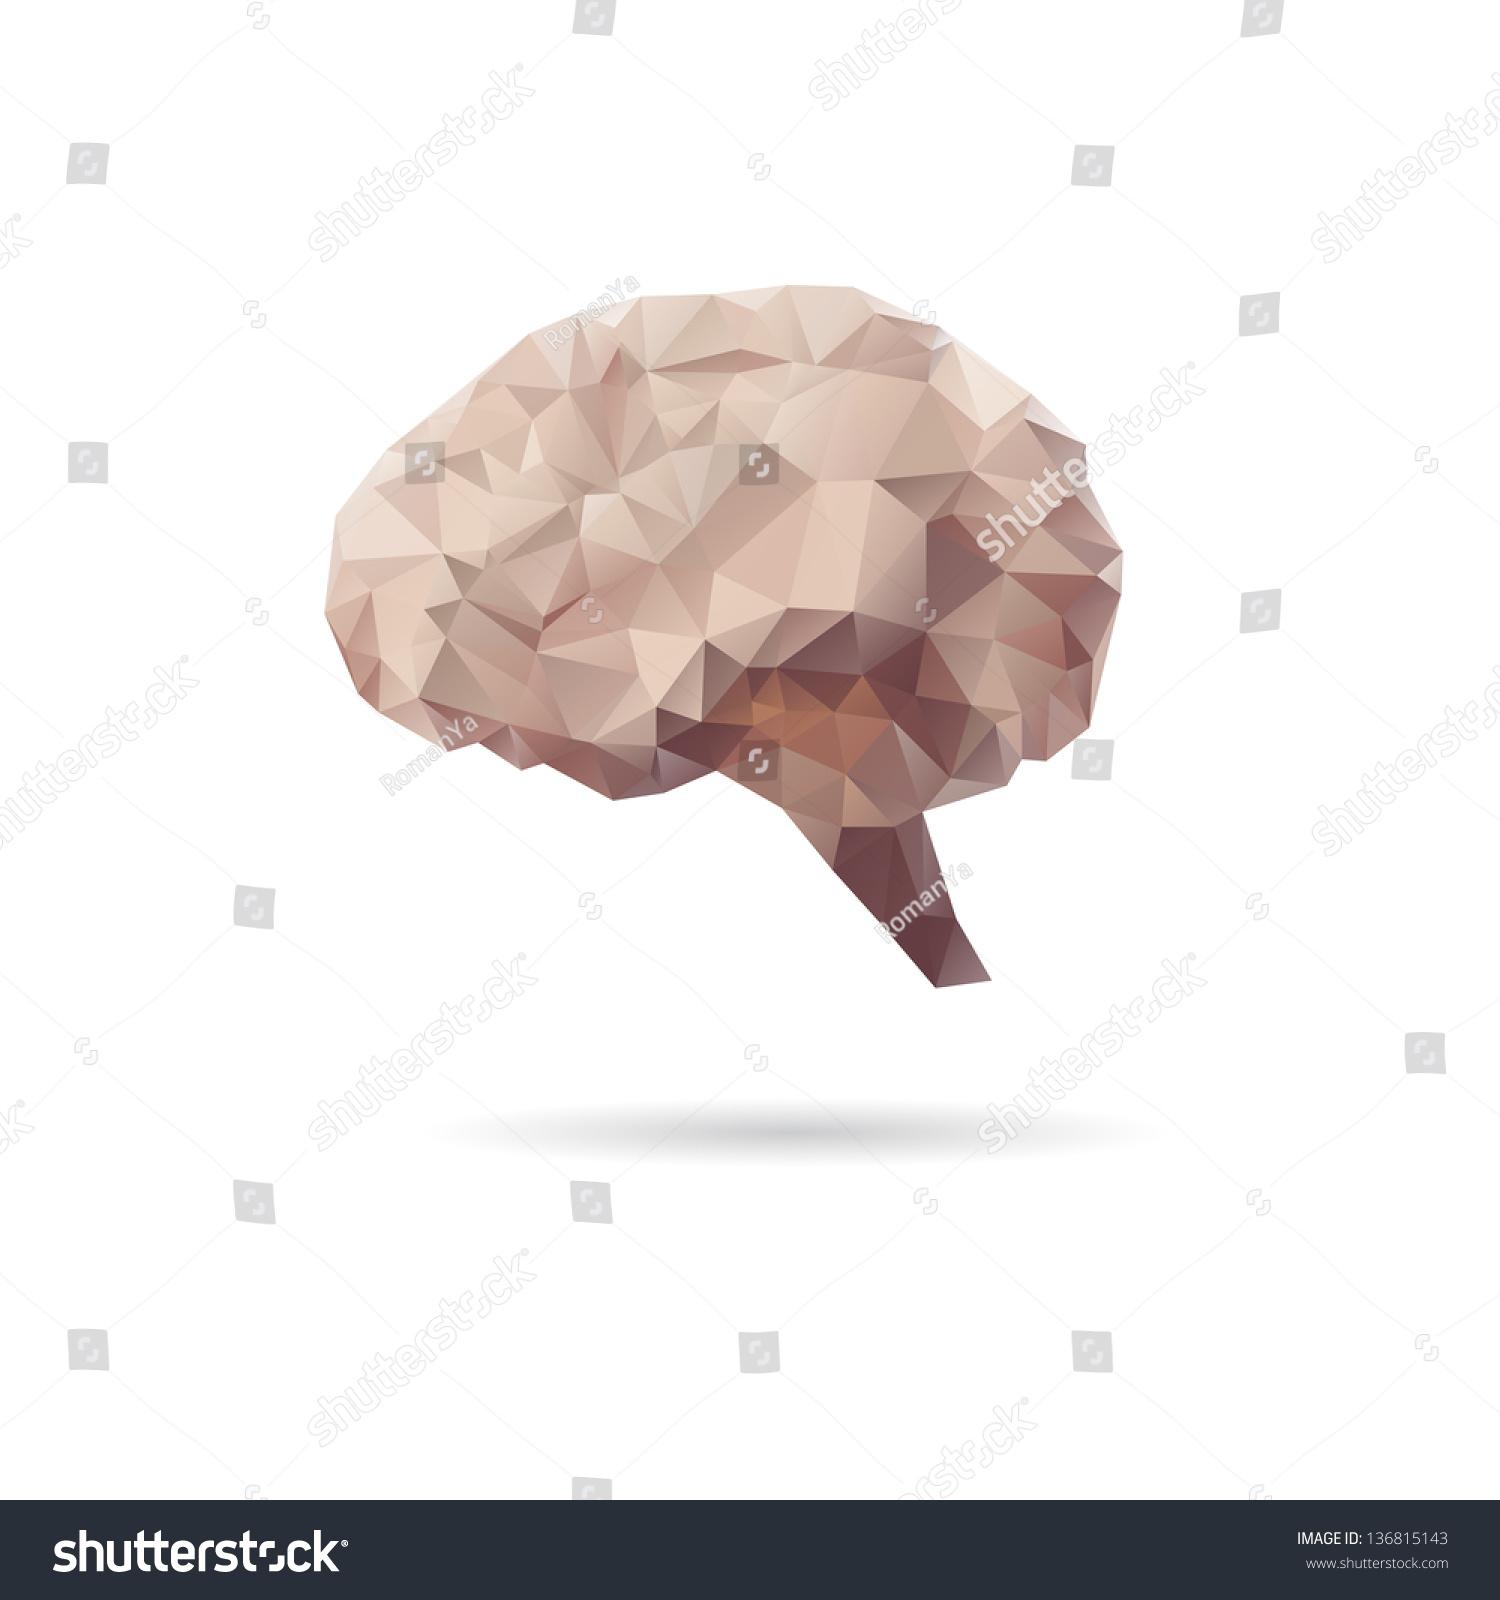 abstract brain wallpaper mind - photo #26